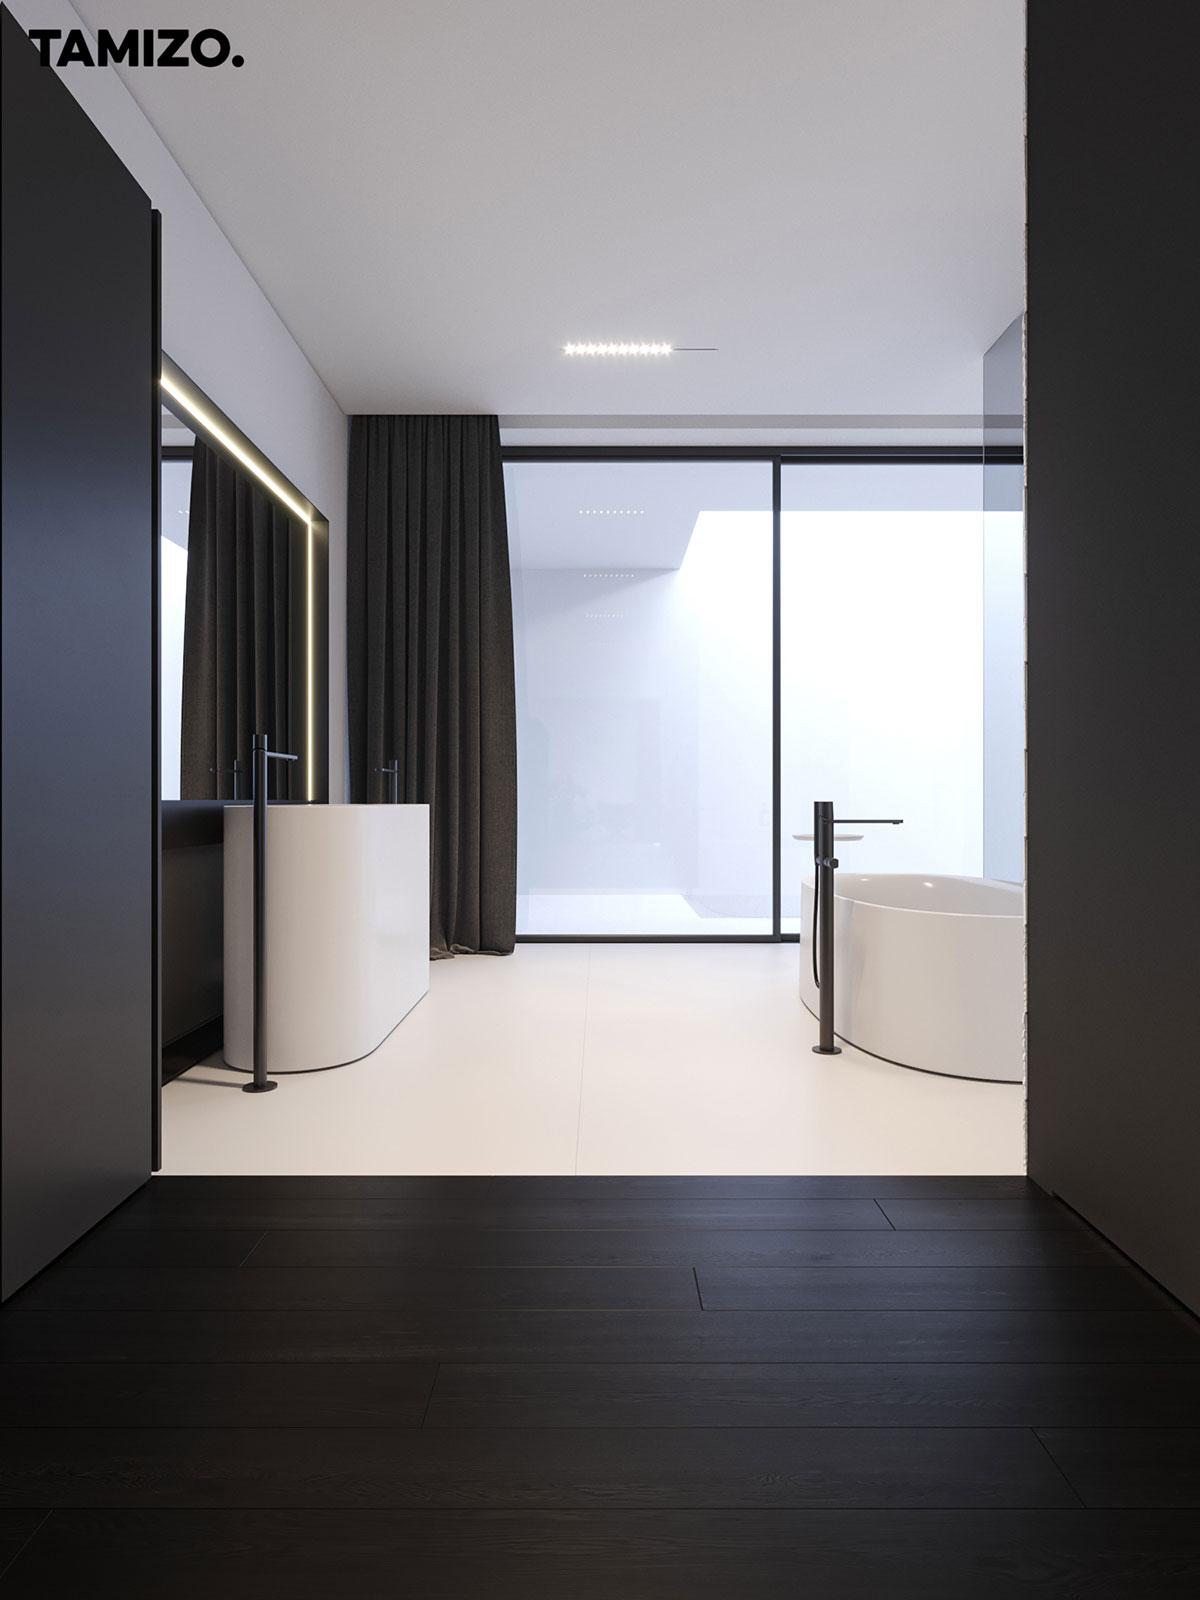 tamizo_architects_mateusz_kuo_stolarski_tomaszow_mazowiecki_interior_design_house_minimal_14